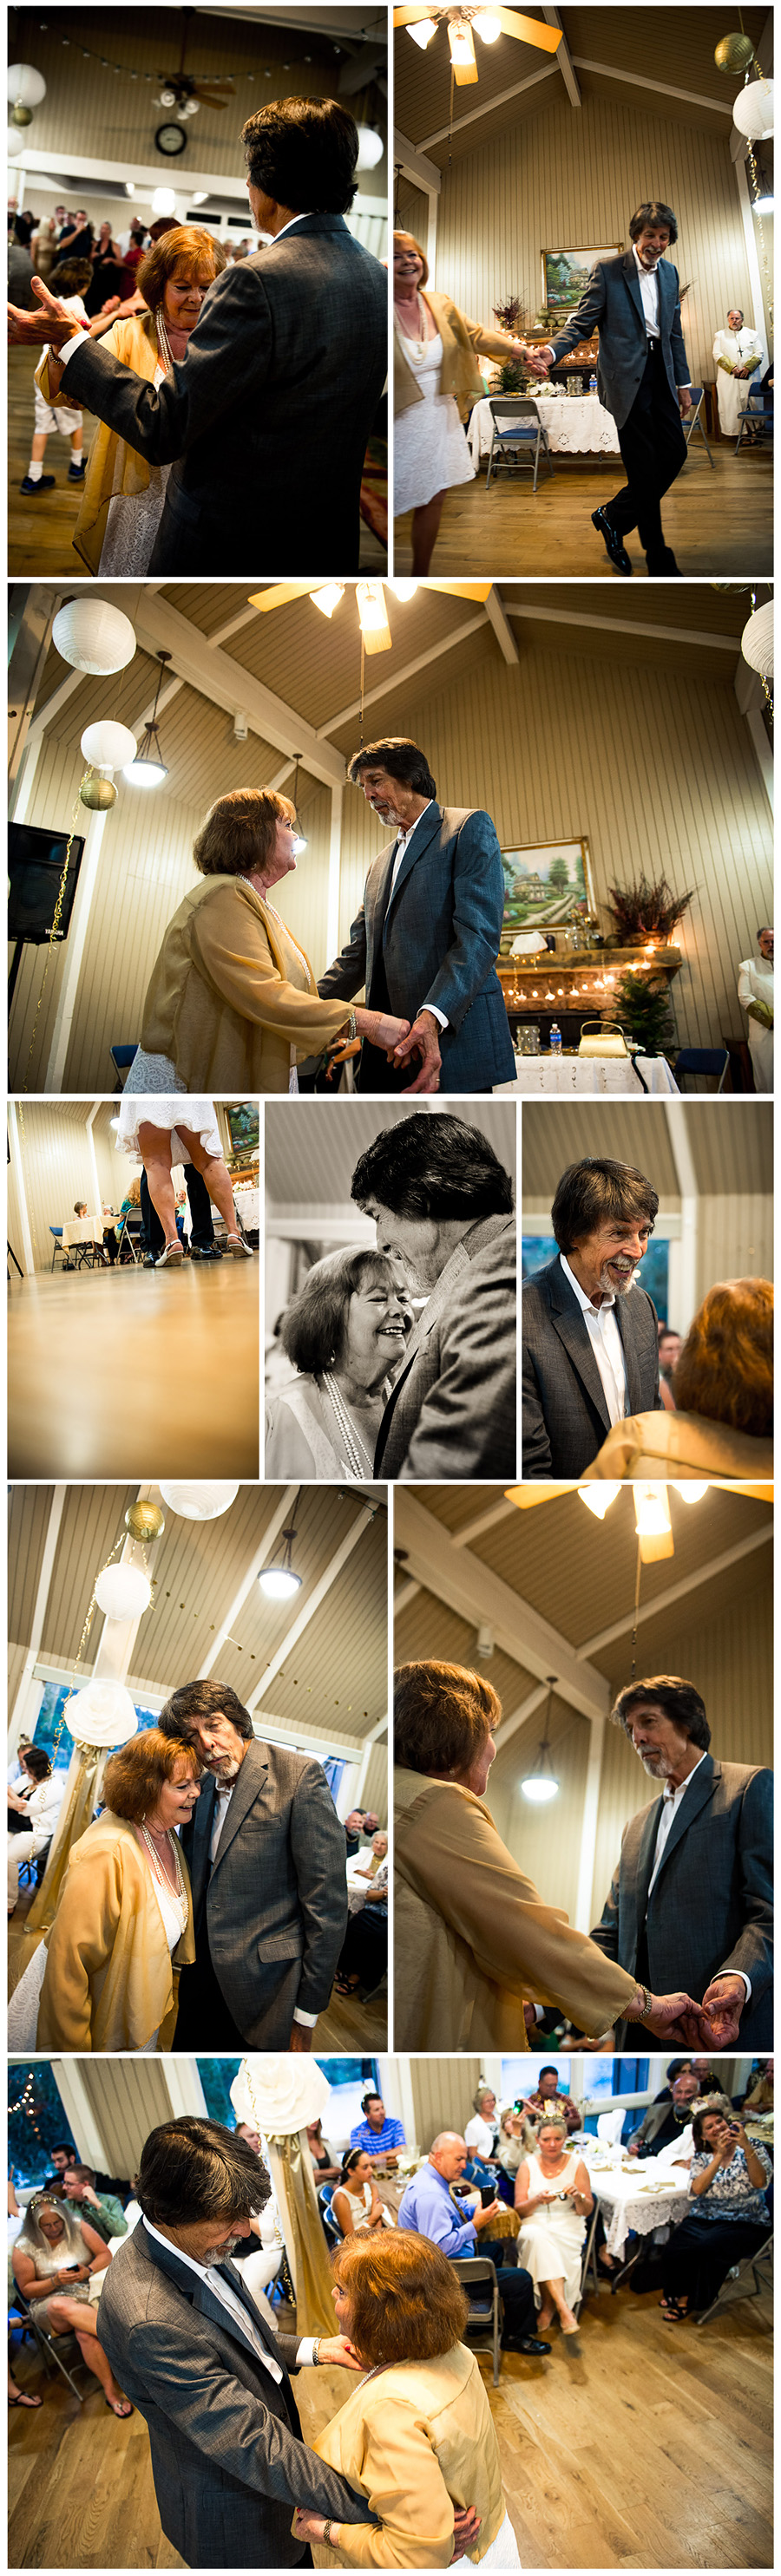 anniversary photos Bedingfield collage 8